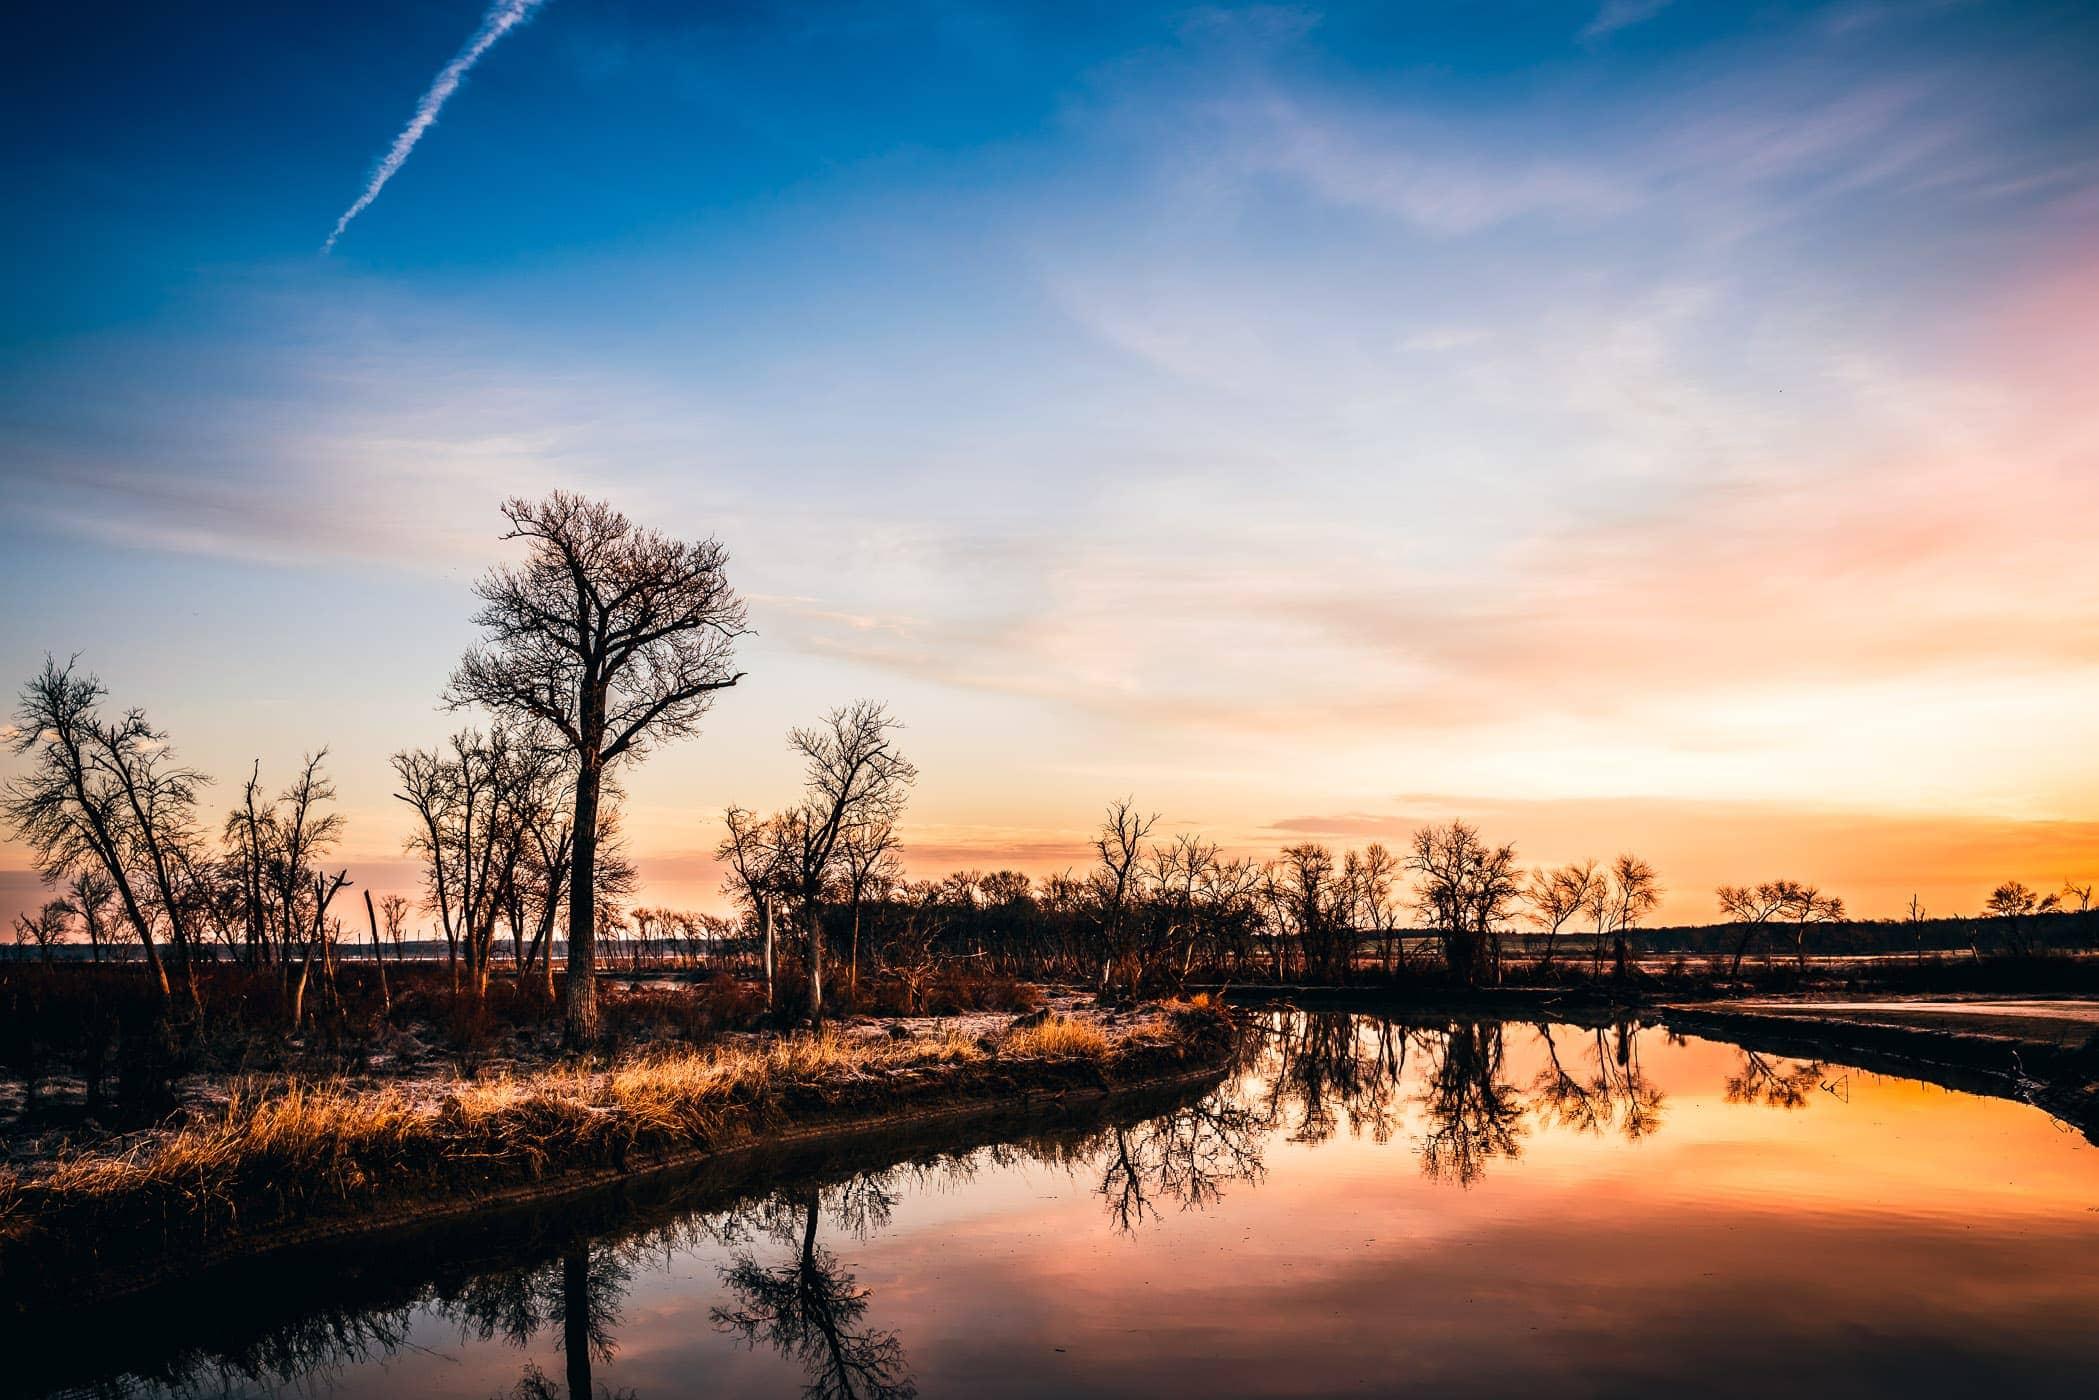 The sun rises at North Texas' Hagerman National Wildlife Refuge.